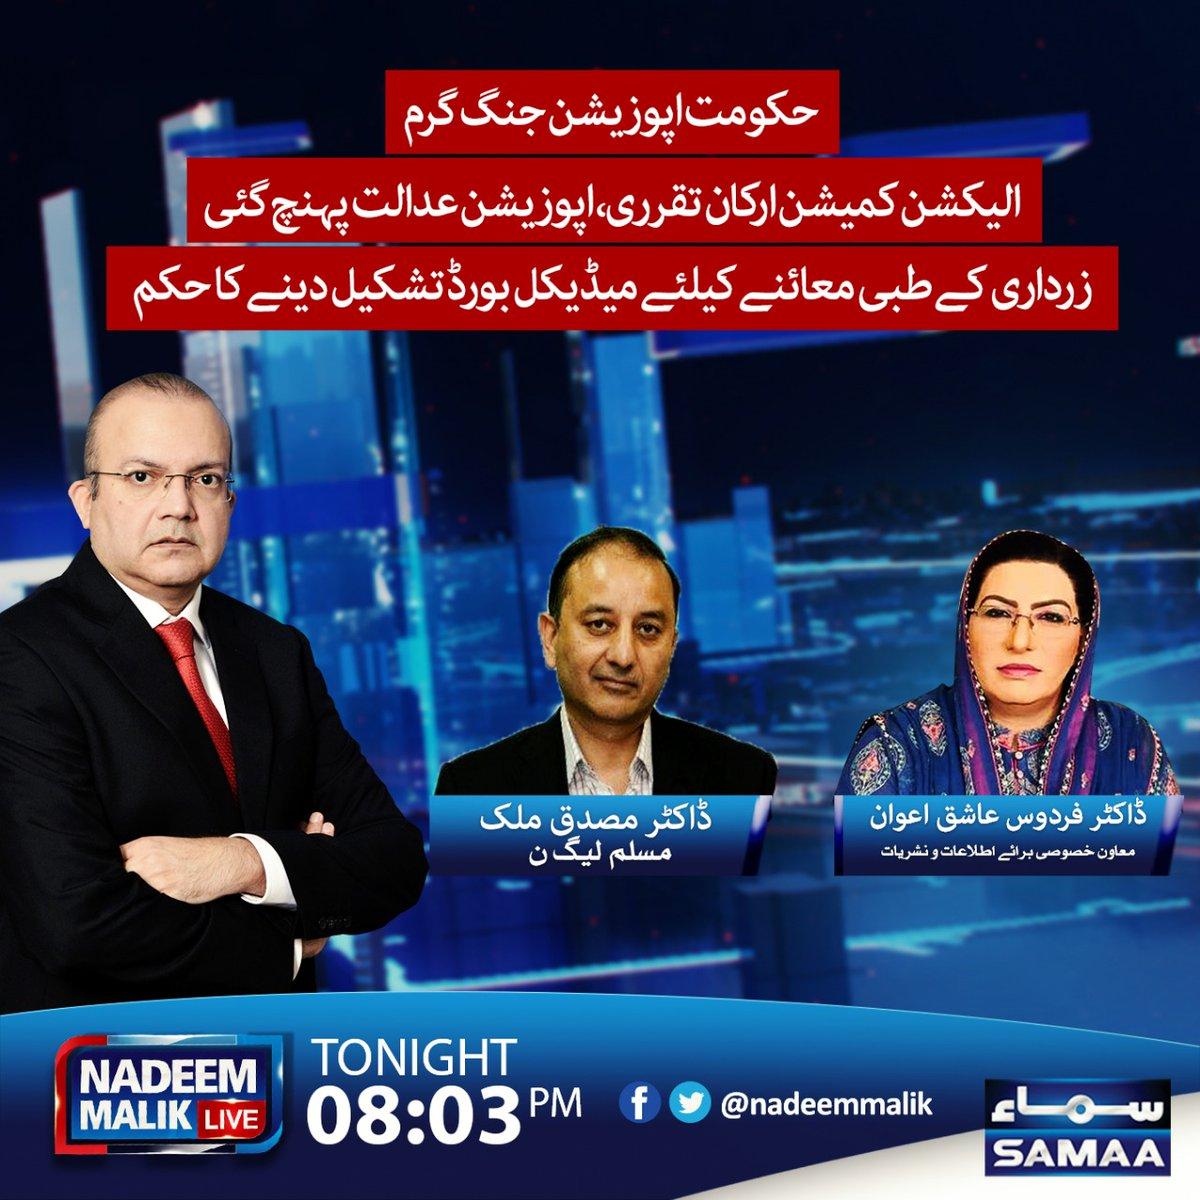 Watch Tonight @DrMusadikMalik @FirdousAshiqAw1 #NadeemMalikLive #Pakistan #SamaaTv